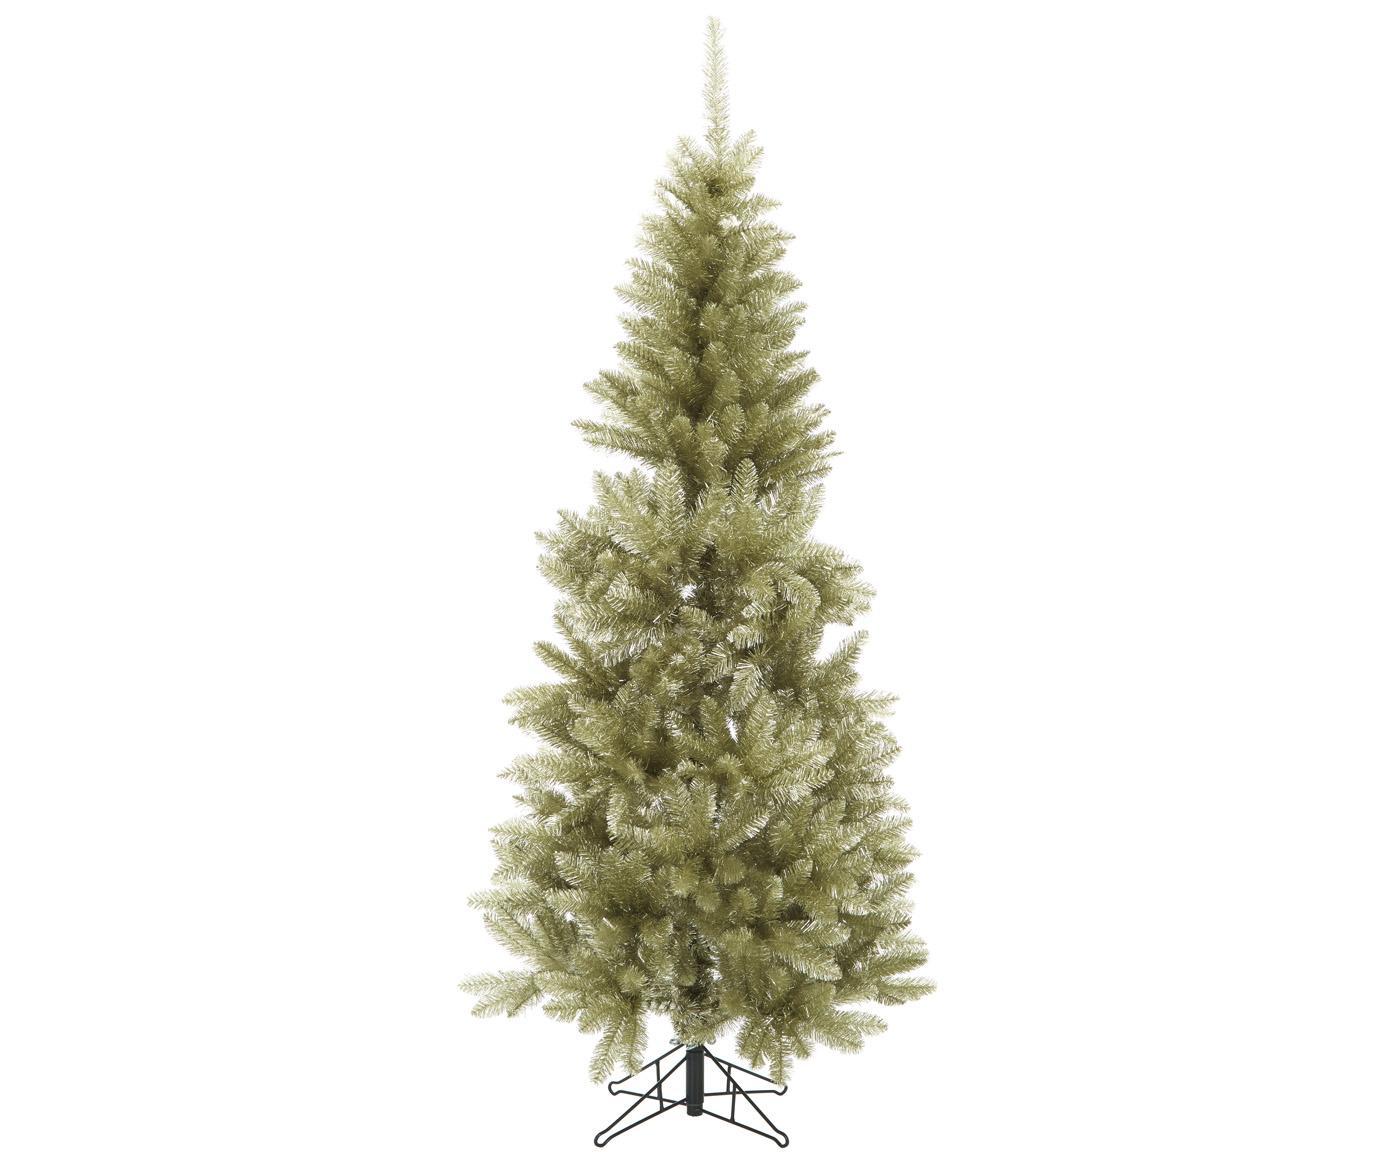 Decoratieve kerstboom Colchester, Kunststof (PVC), Champagnekleurig, Ø 84 x H 185 cm